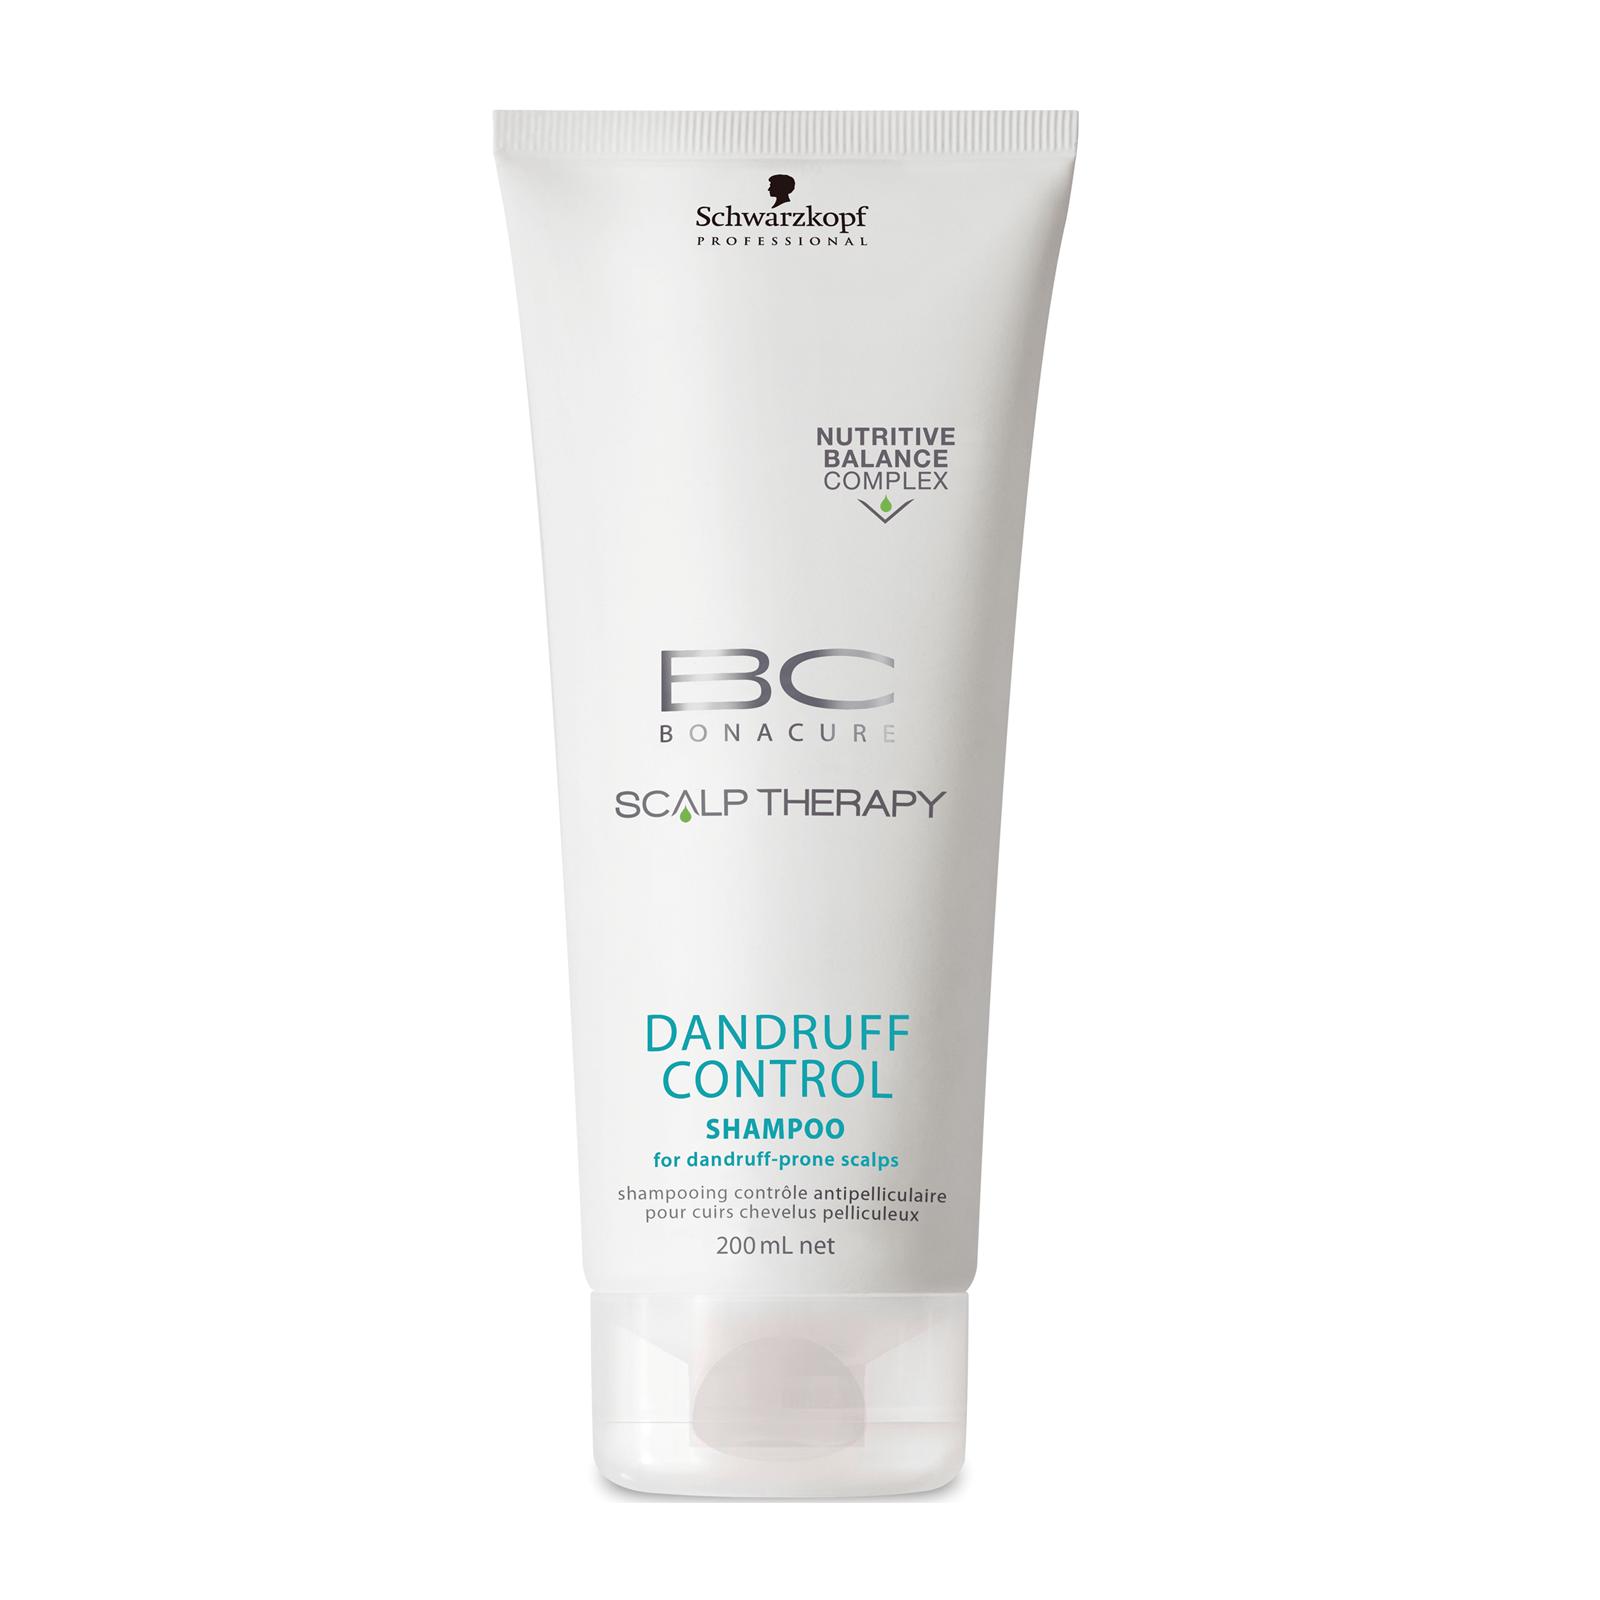 Schwarzkopf Professional BC Scalp Therapy Dandruff Control Shampoo 200ml schwarzkopf   περιποιηση   ευαίσθητο τριχωτό τριχόπτωση λιπαρότητα πιτυρίδα ξηρο